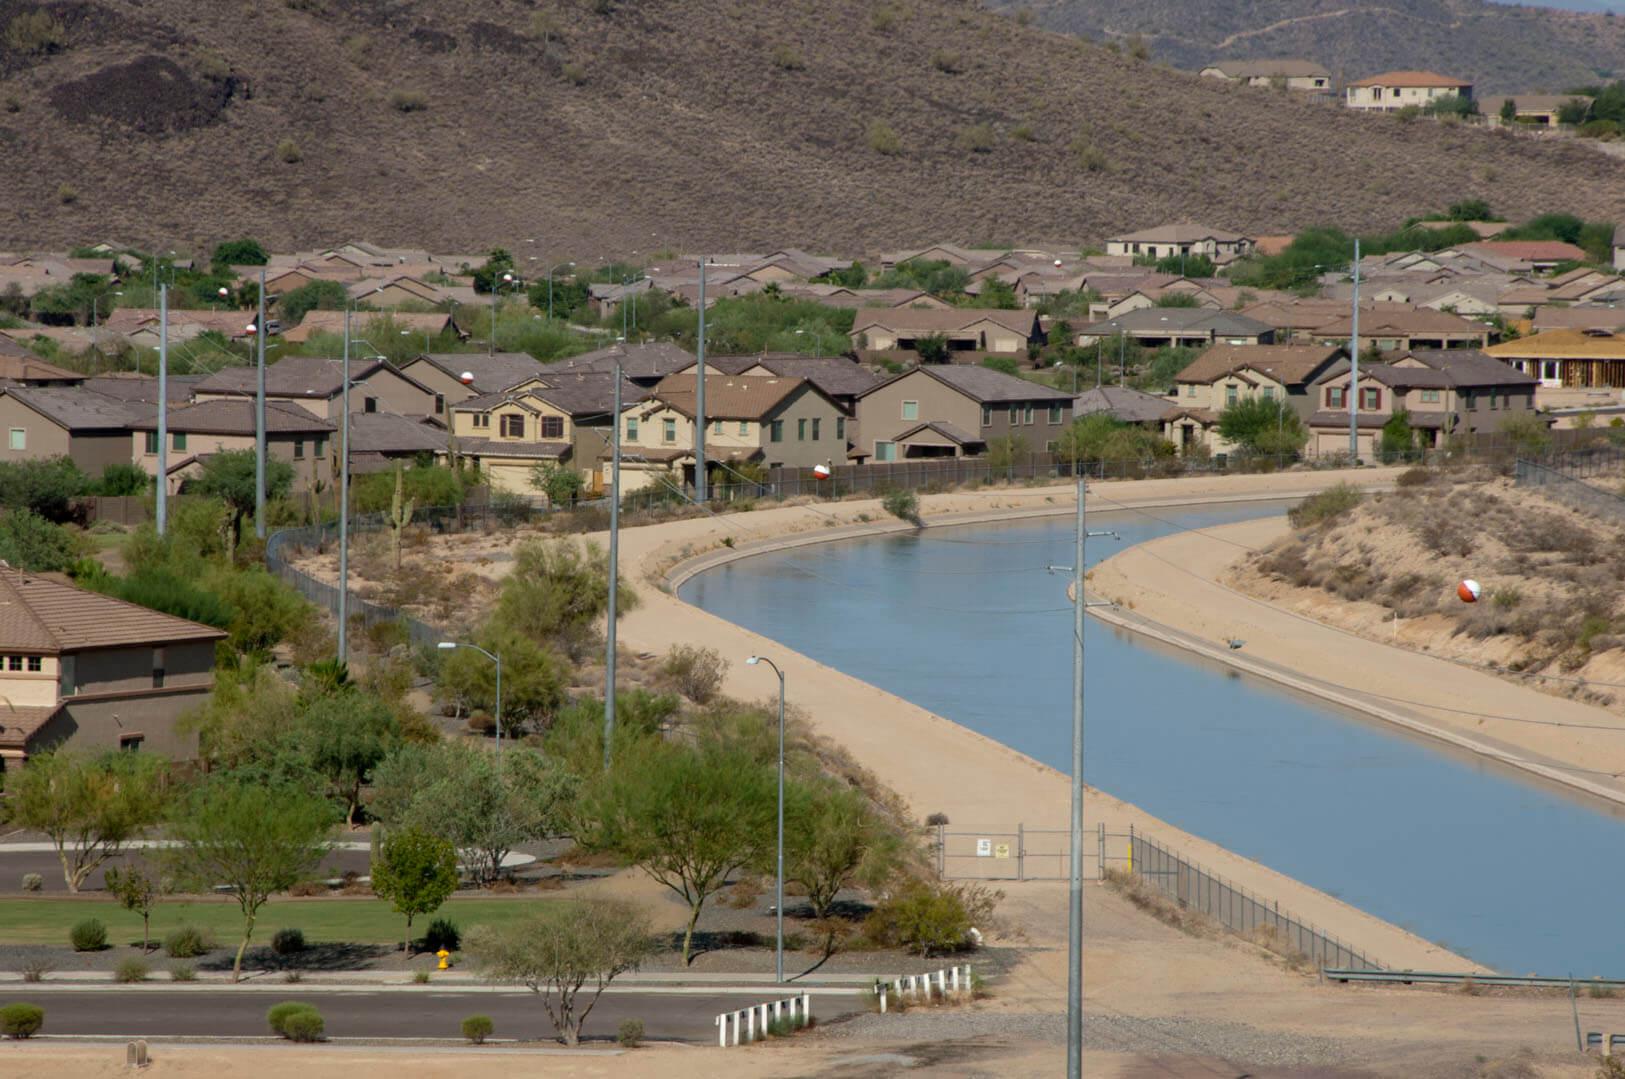 Planning for Arizona's Water Future